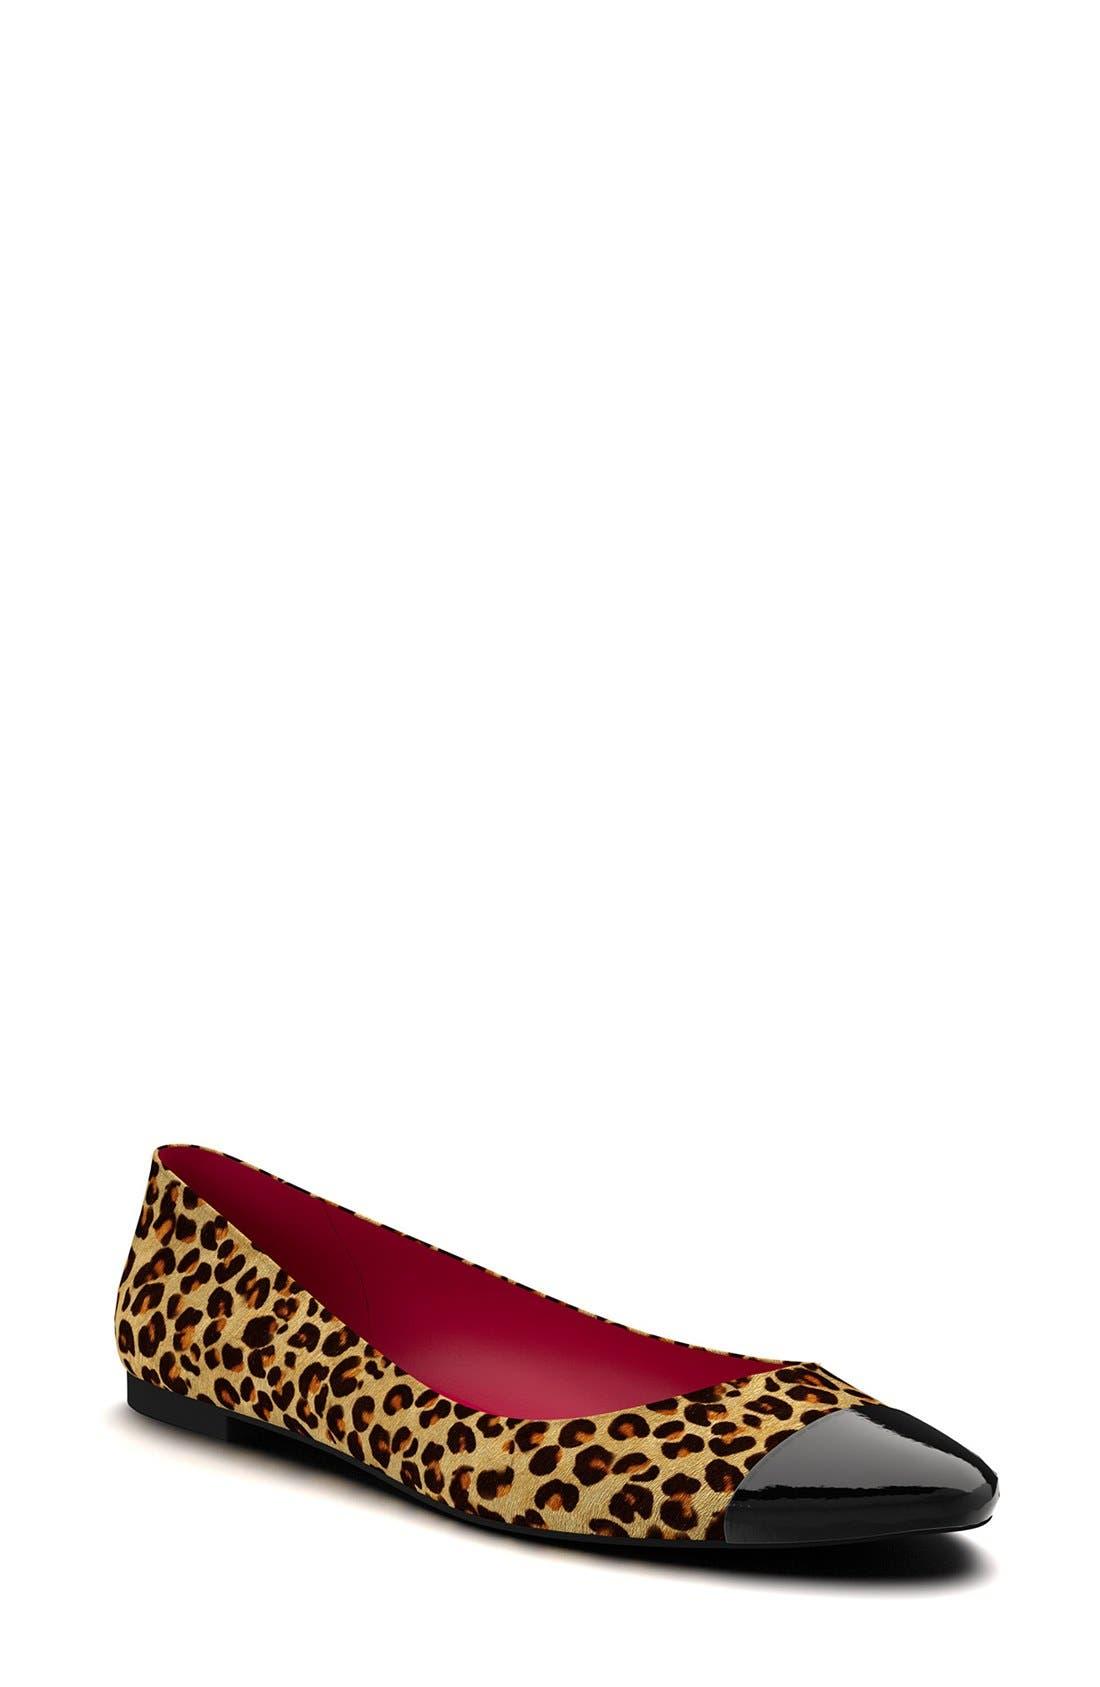 Alternate Image 1 Selected - Shoes of Prey Leopard Genuine Calf Hair Ballet Flat (Women)